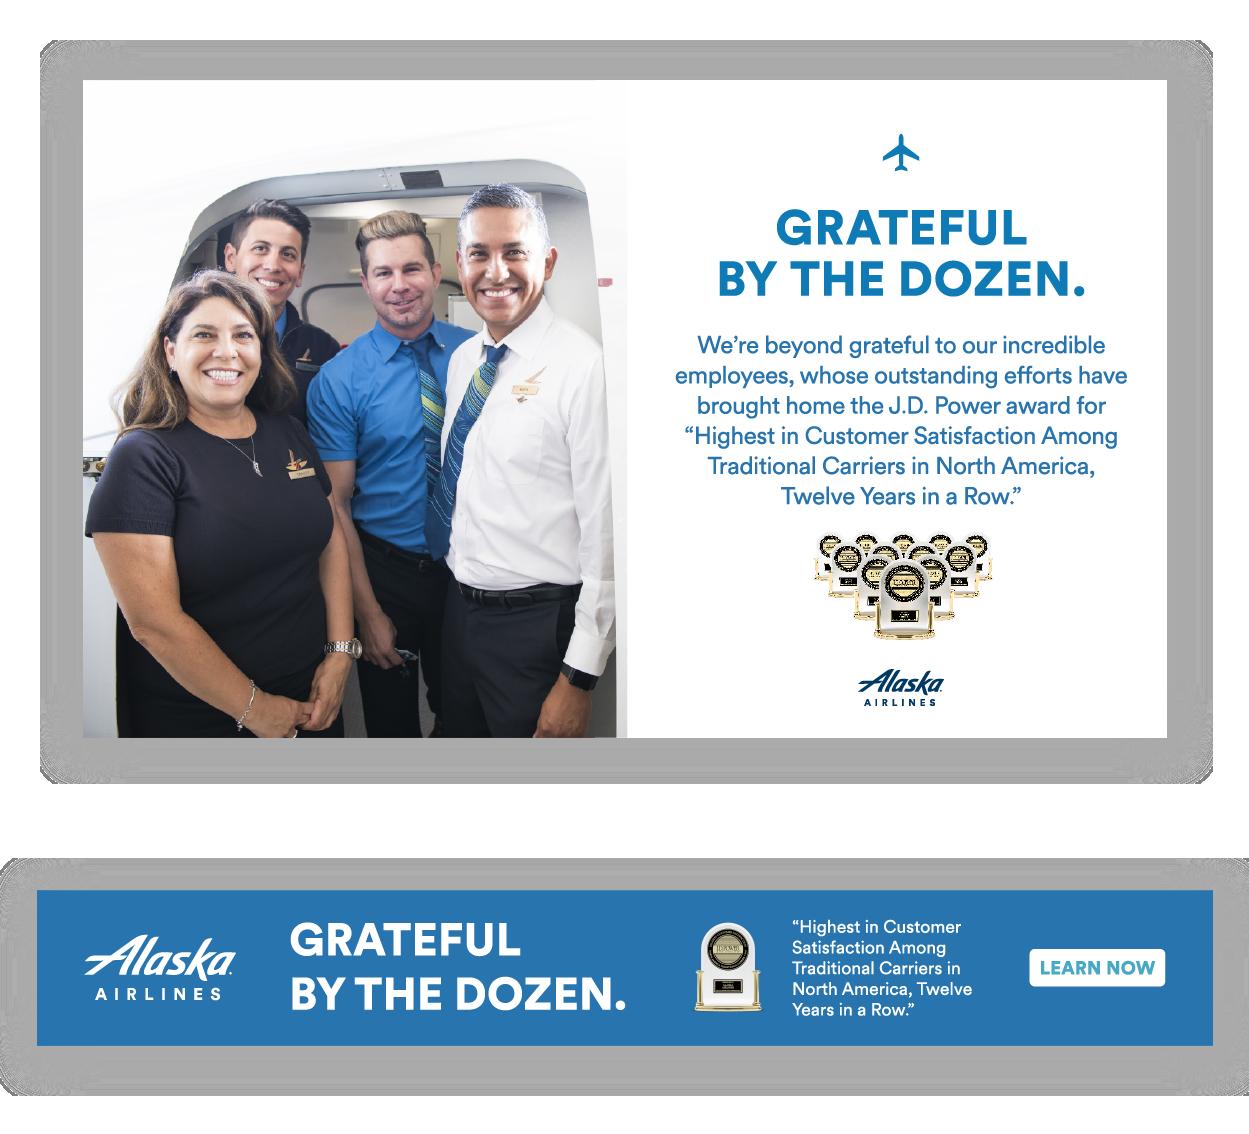 Alaska-Air_JDP-Award-Campaign_Ad-2.png